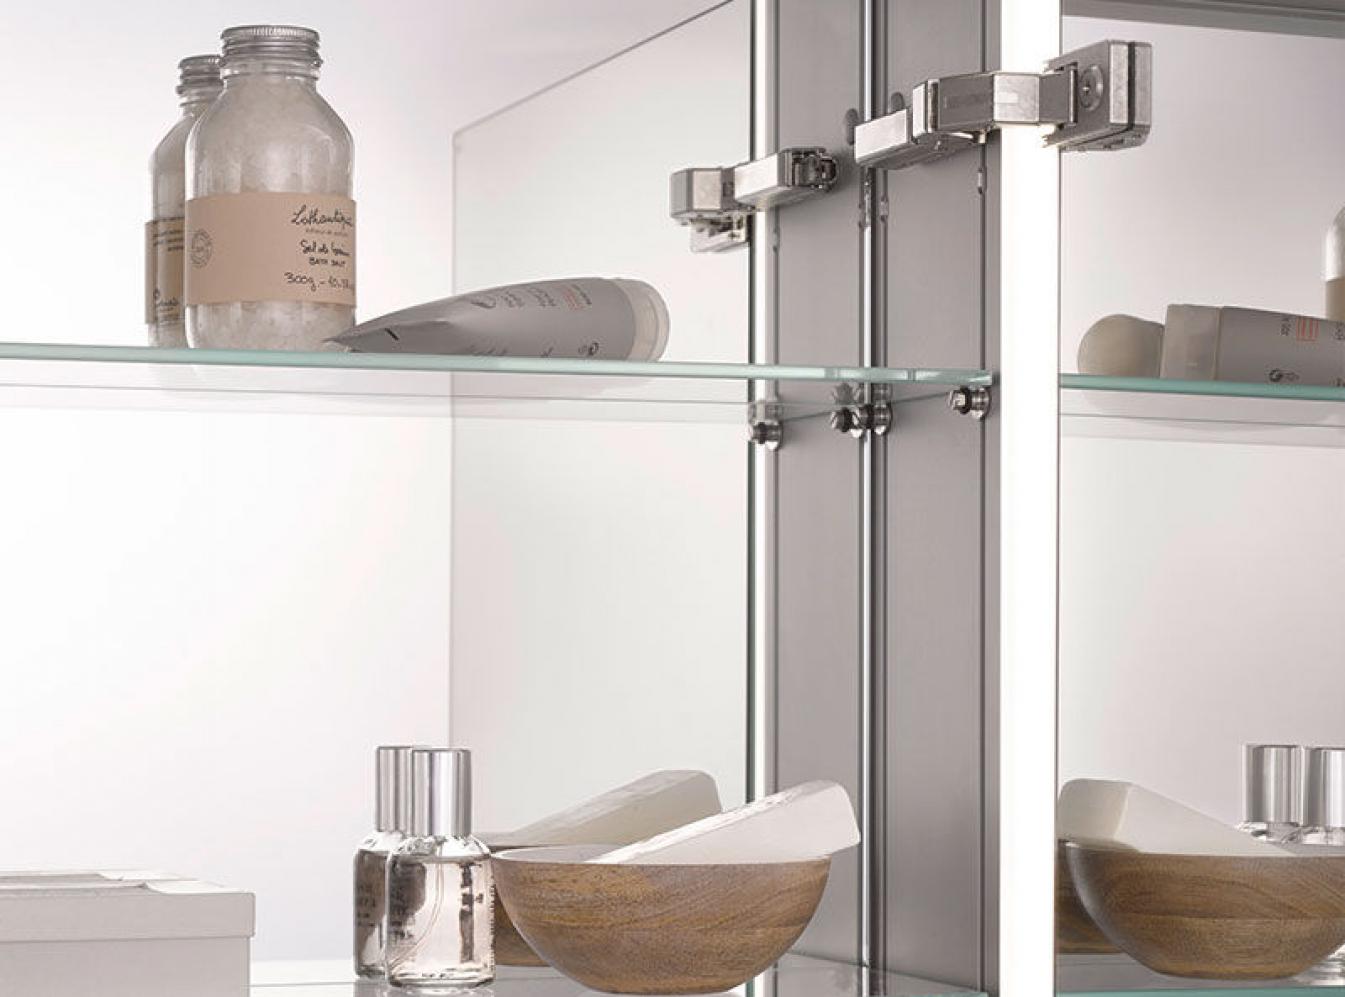 emco spiegelschrank mit innovativer technik. Black Bedroom Furniture Sets. Home Design Ideas